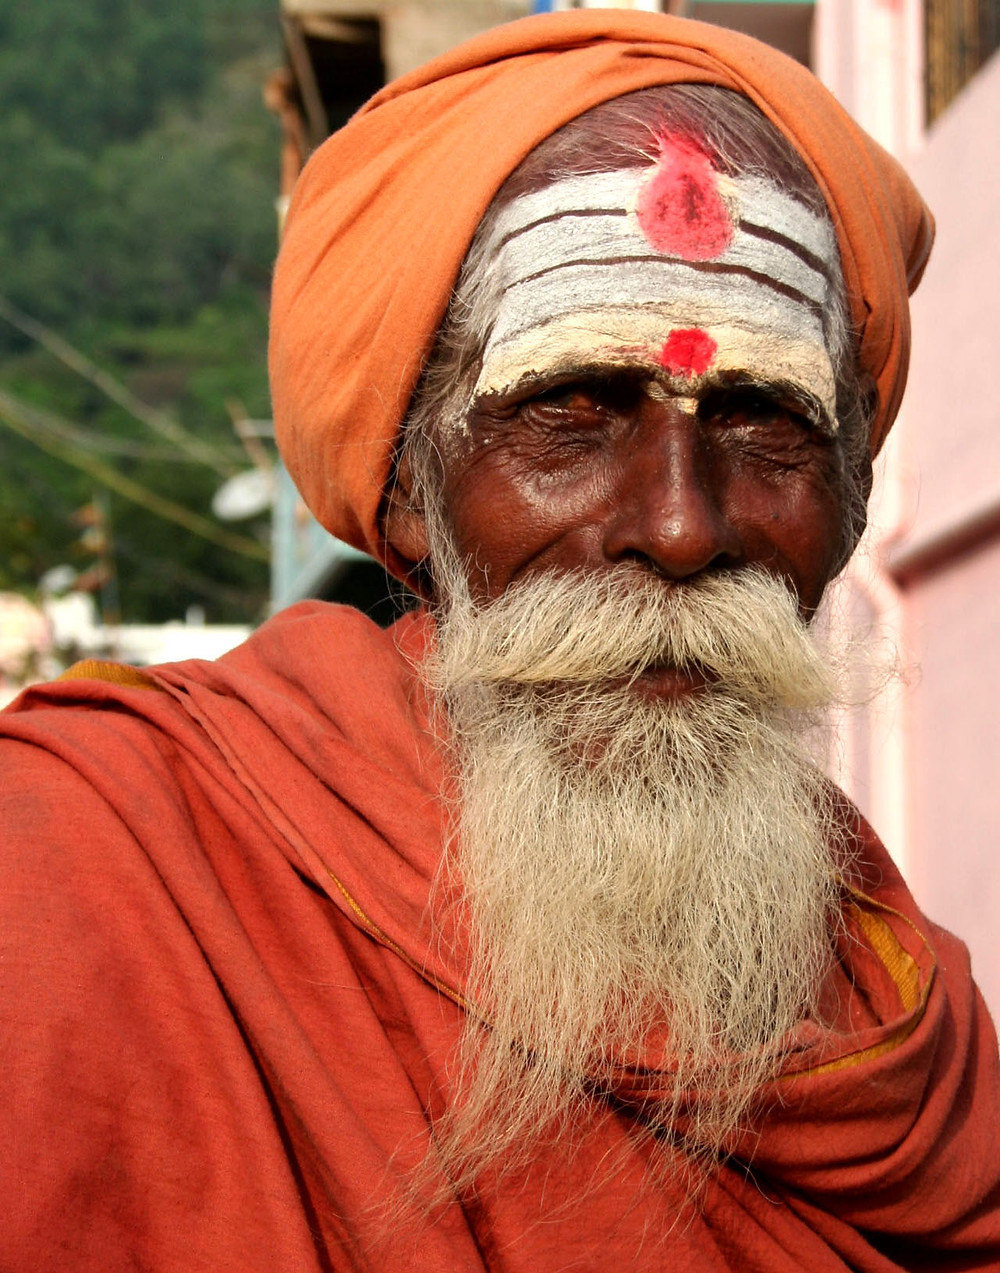 Sadhu sulla collina di Arunachala (India – Tamil Nadu, Kerala, Karnataka – novembre/dicembre 2017)